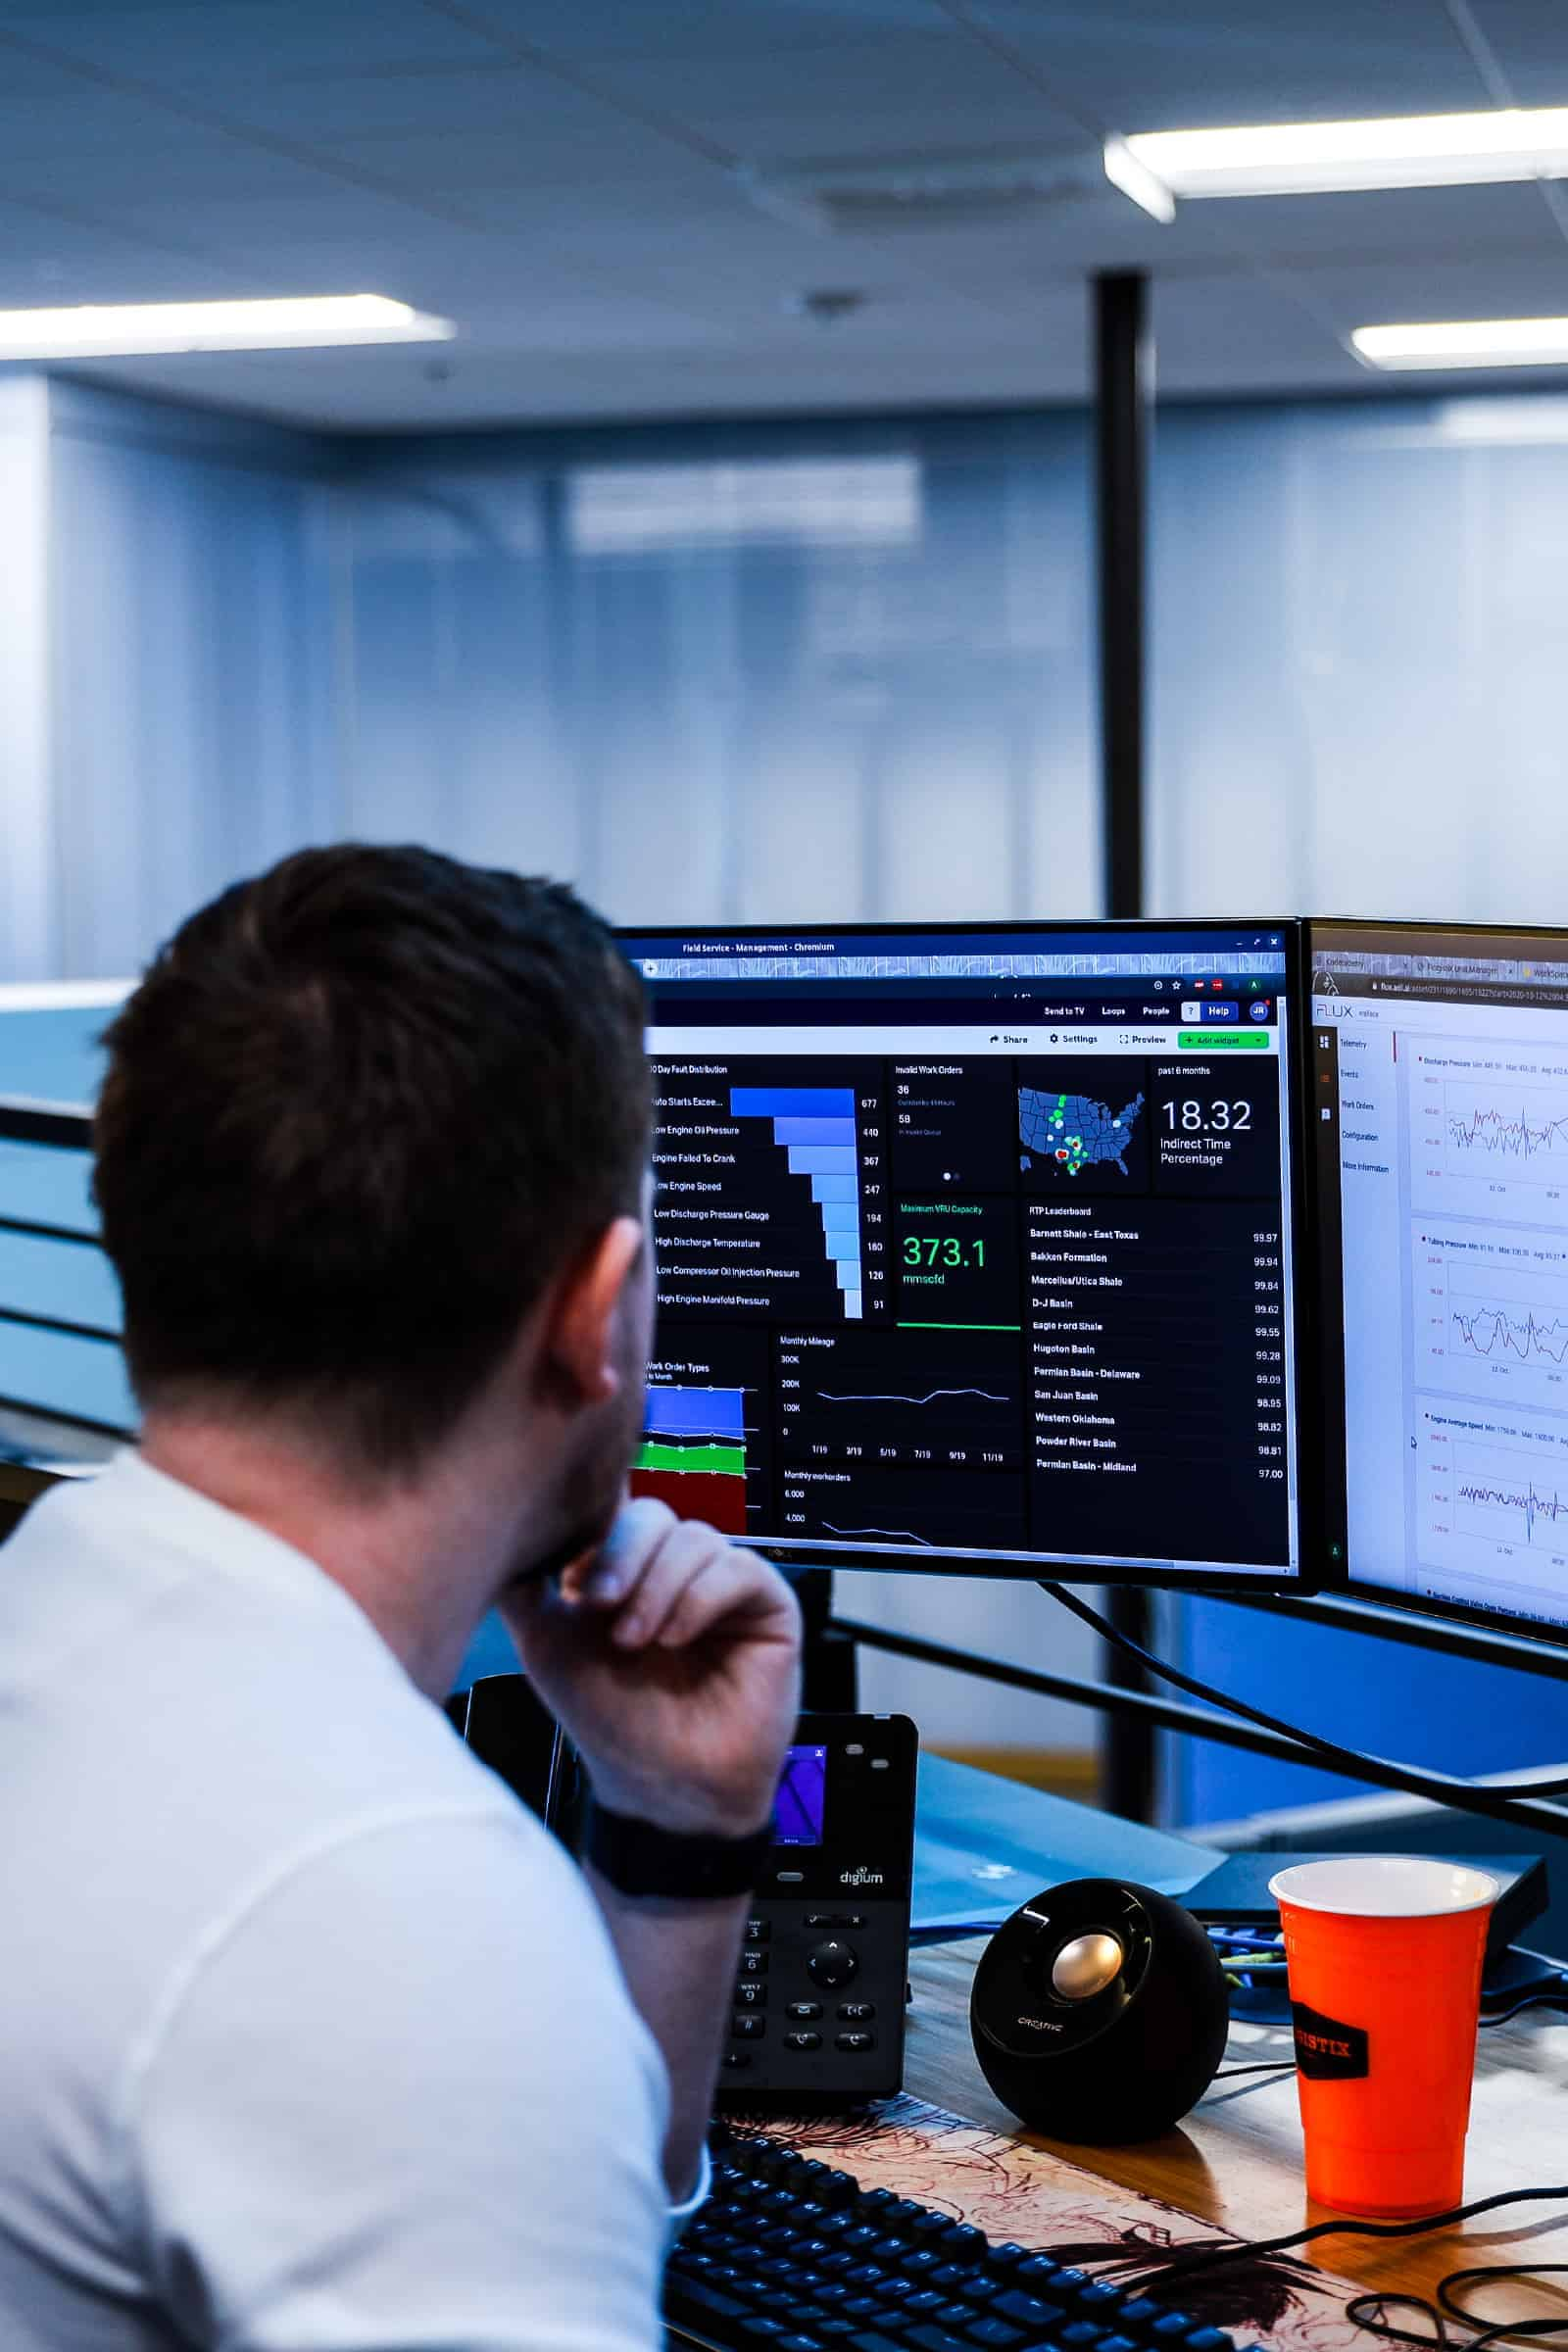 Man looking at computer screens with data